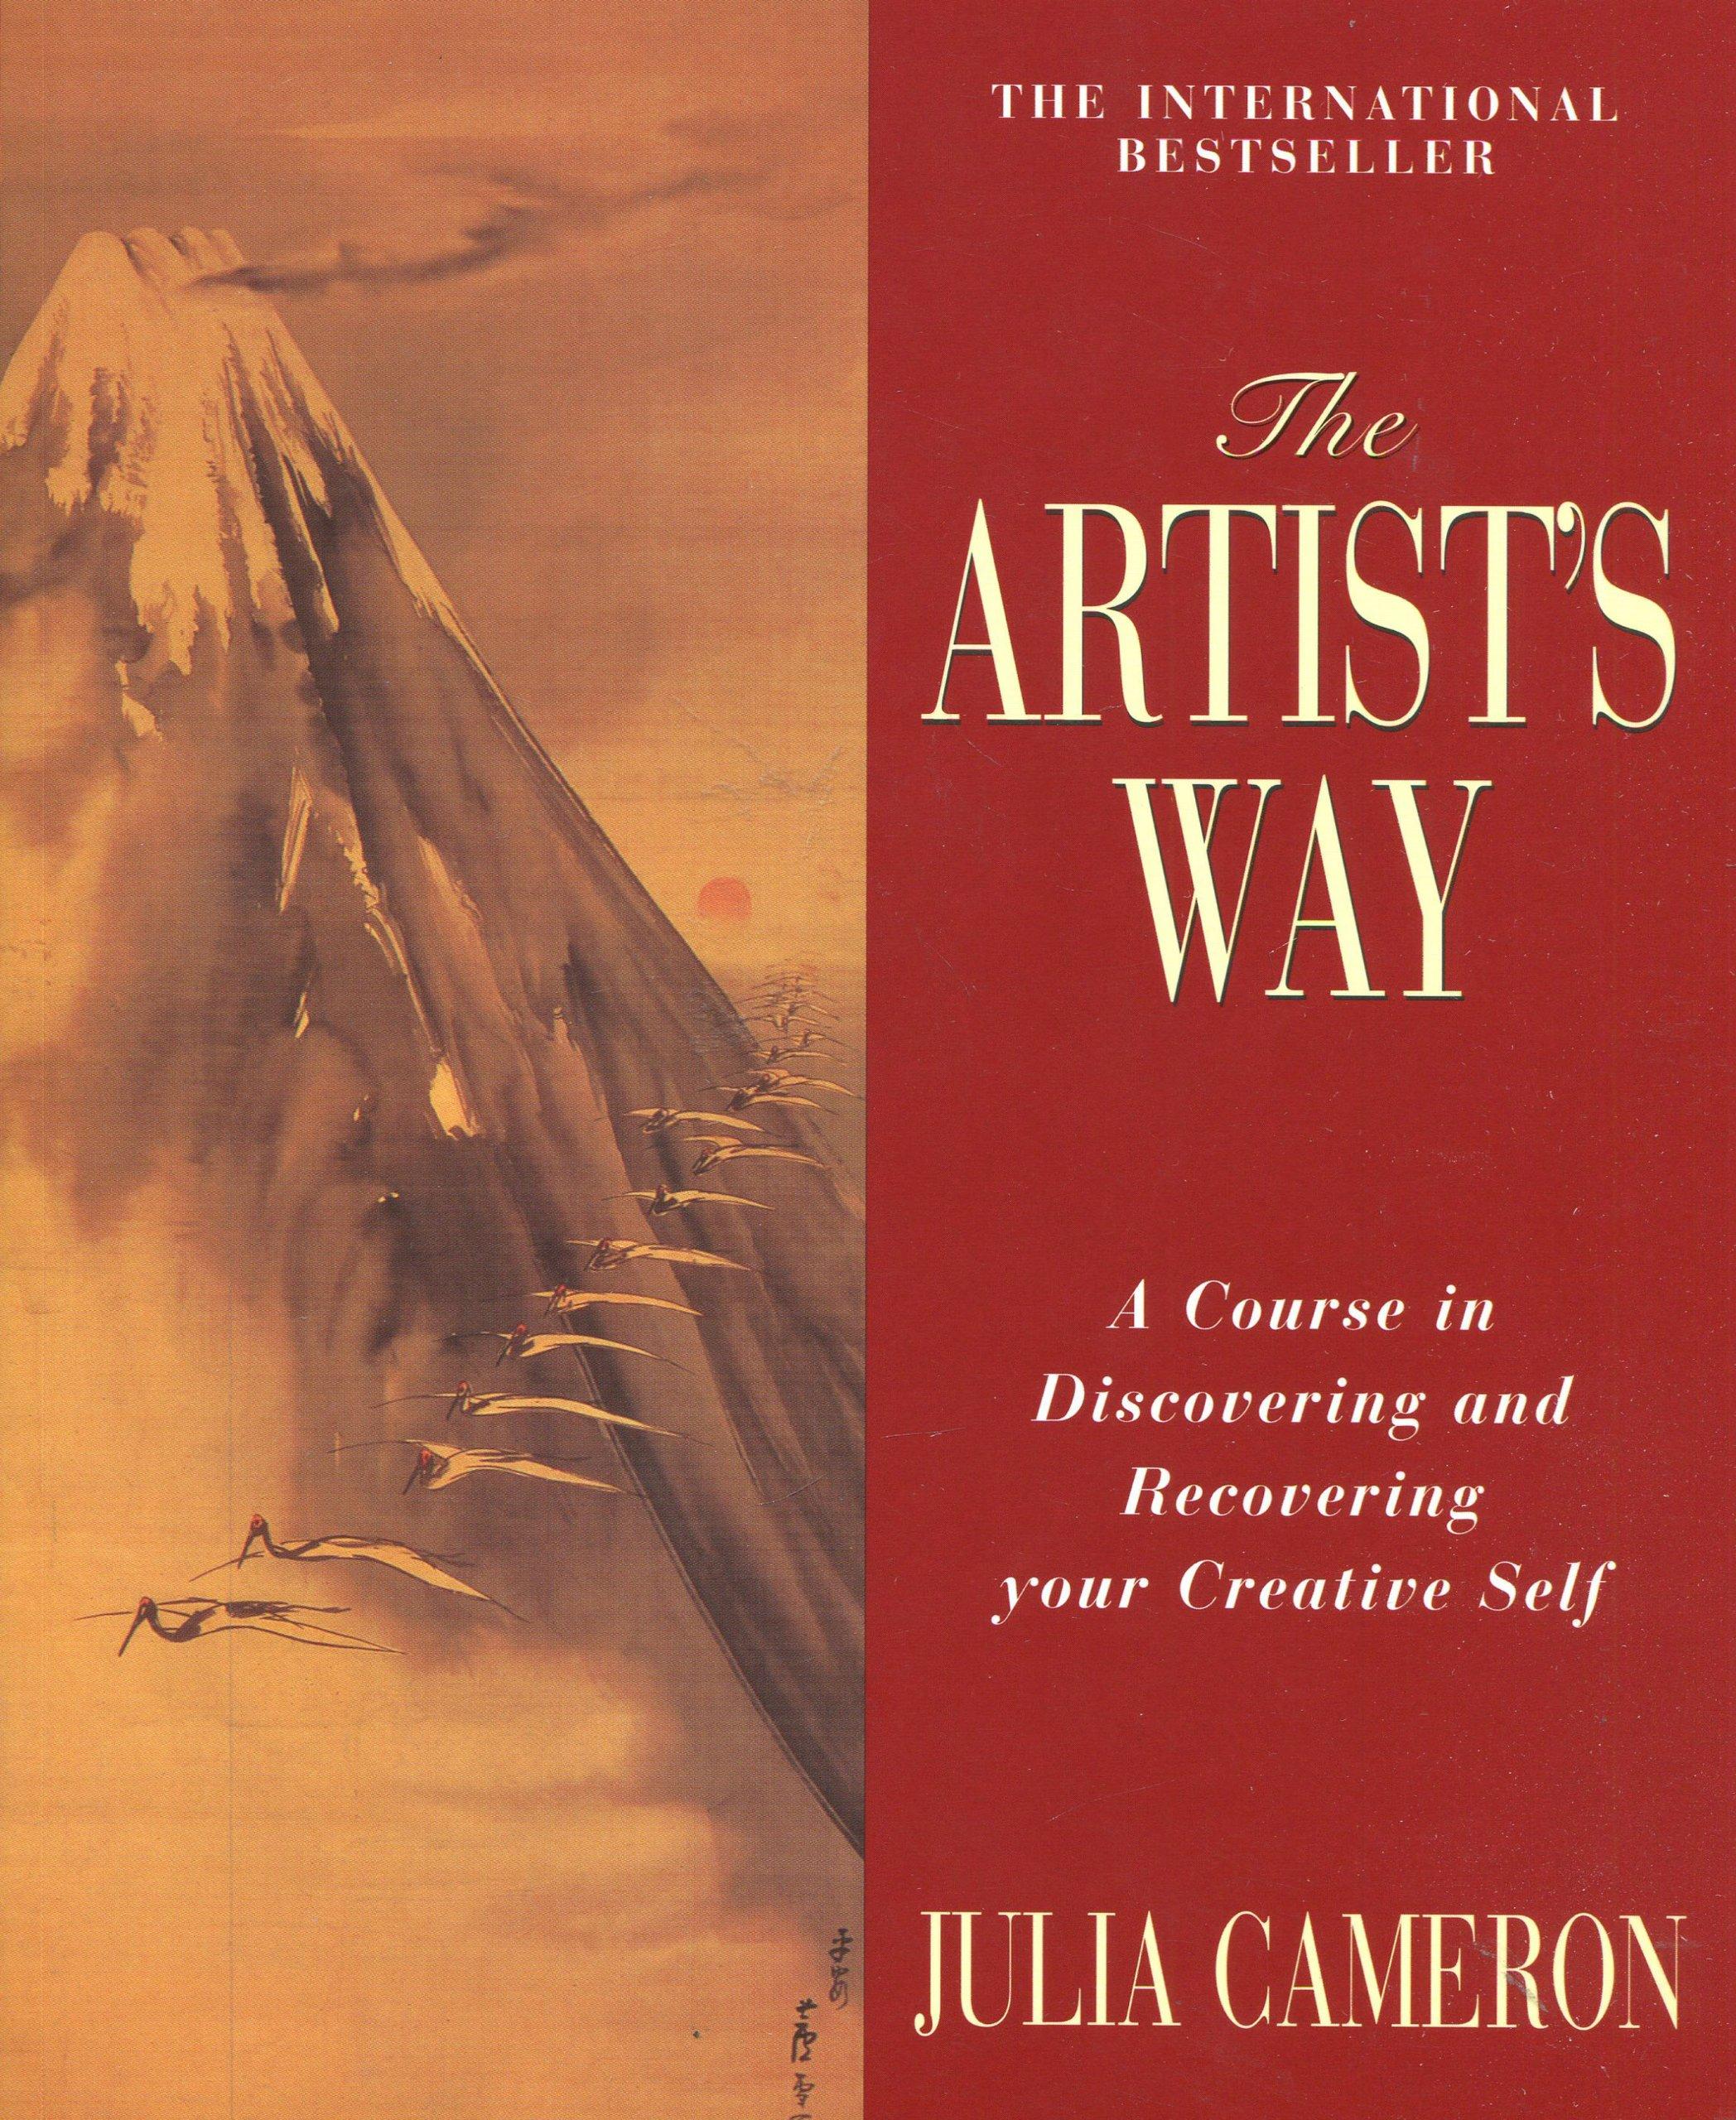 The Artist's Way - by Julia Cameron (TarcherPerigee)